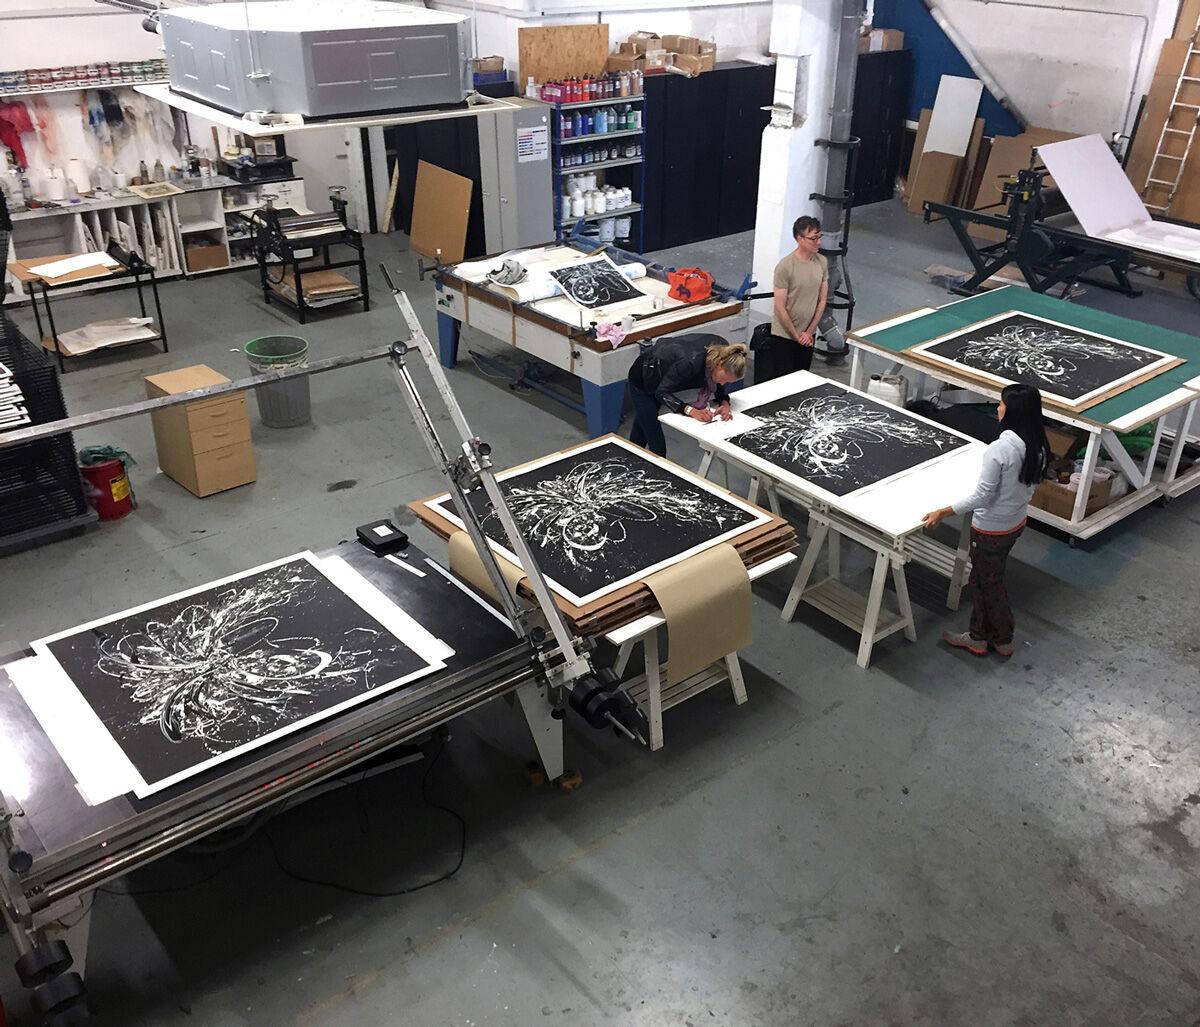 Katrin Fridrikssigningprints at Lazarides Editions.Courtesy Lazarides